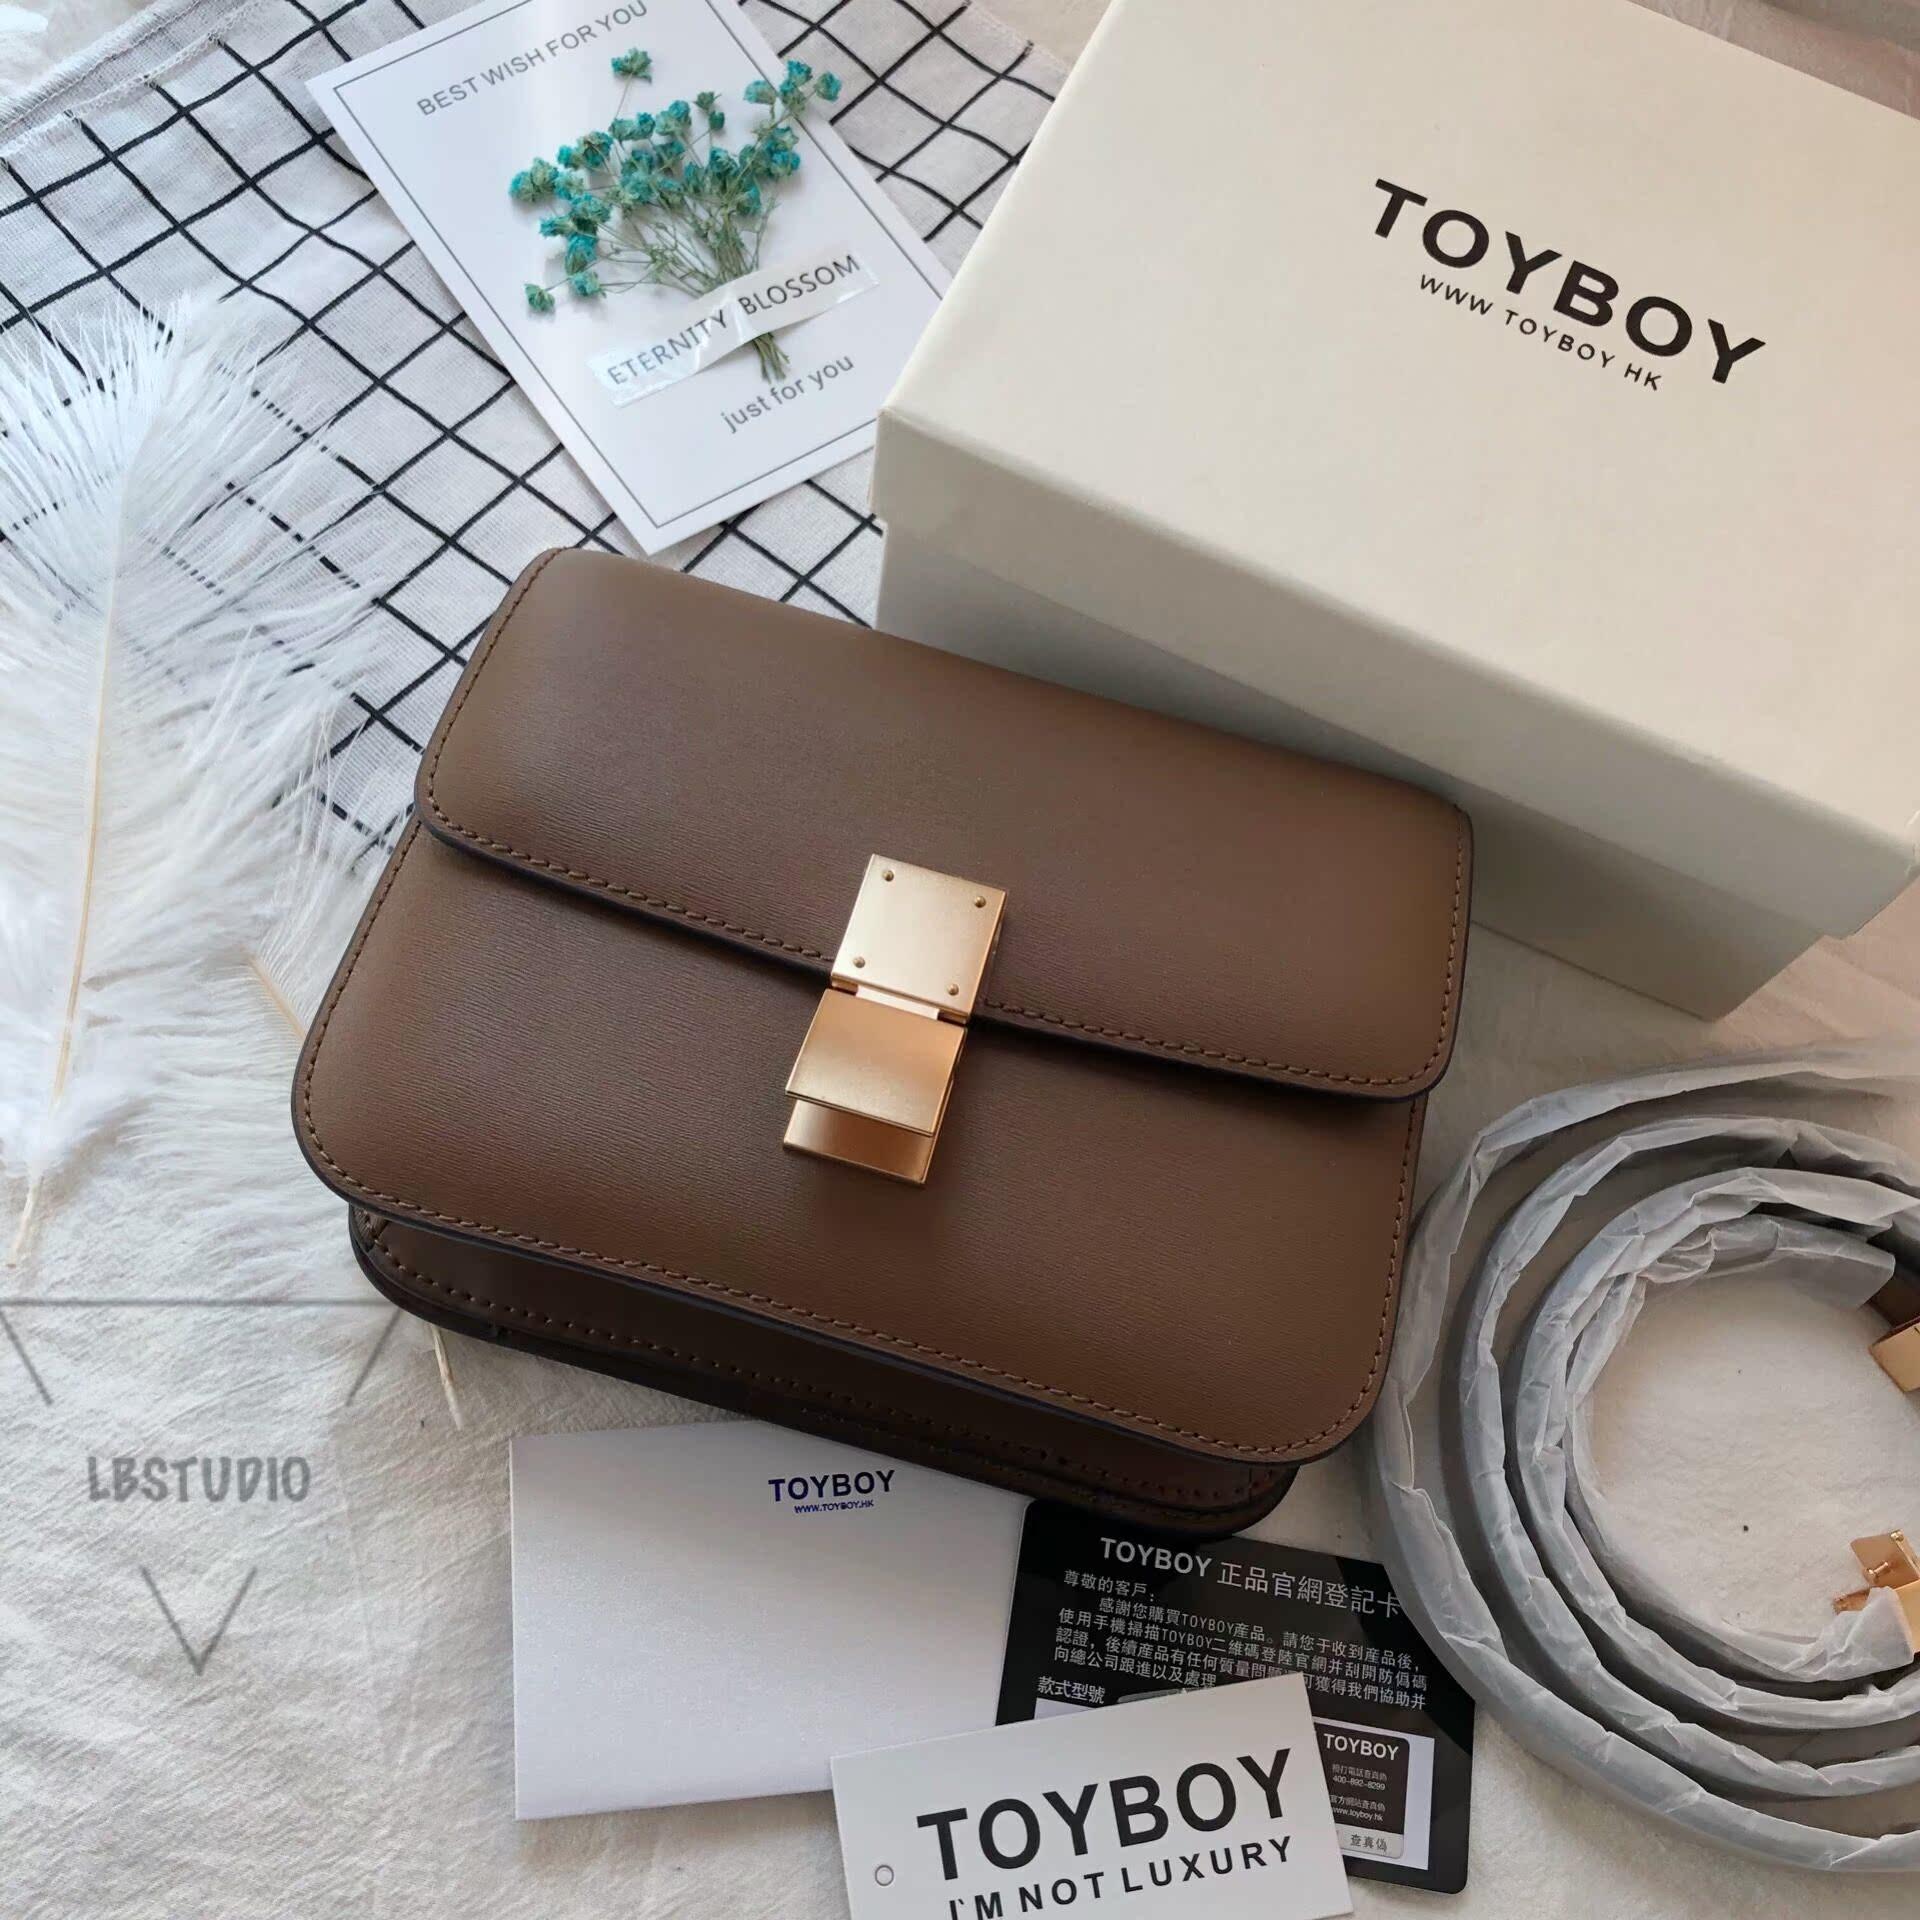 d48f472caa5b ... Hong Kong street brand toyboy calf tofu bag box handkerchief new retro  small square bag handbag